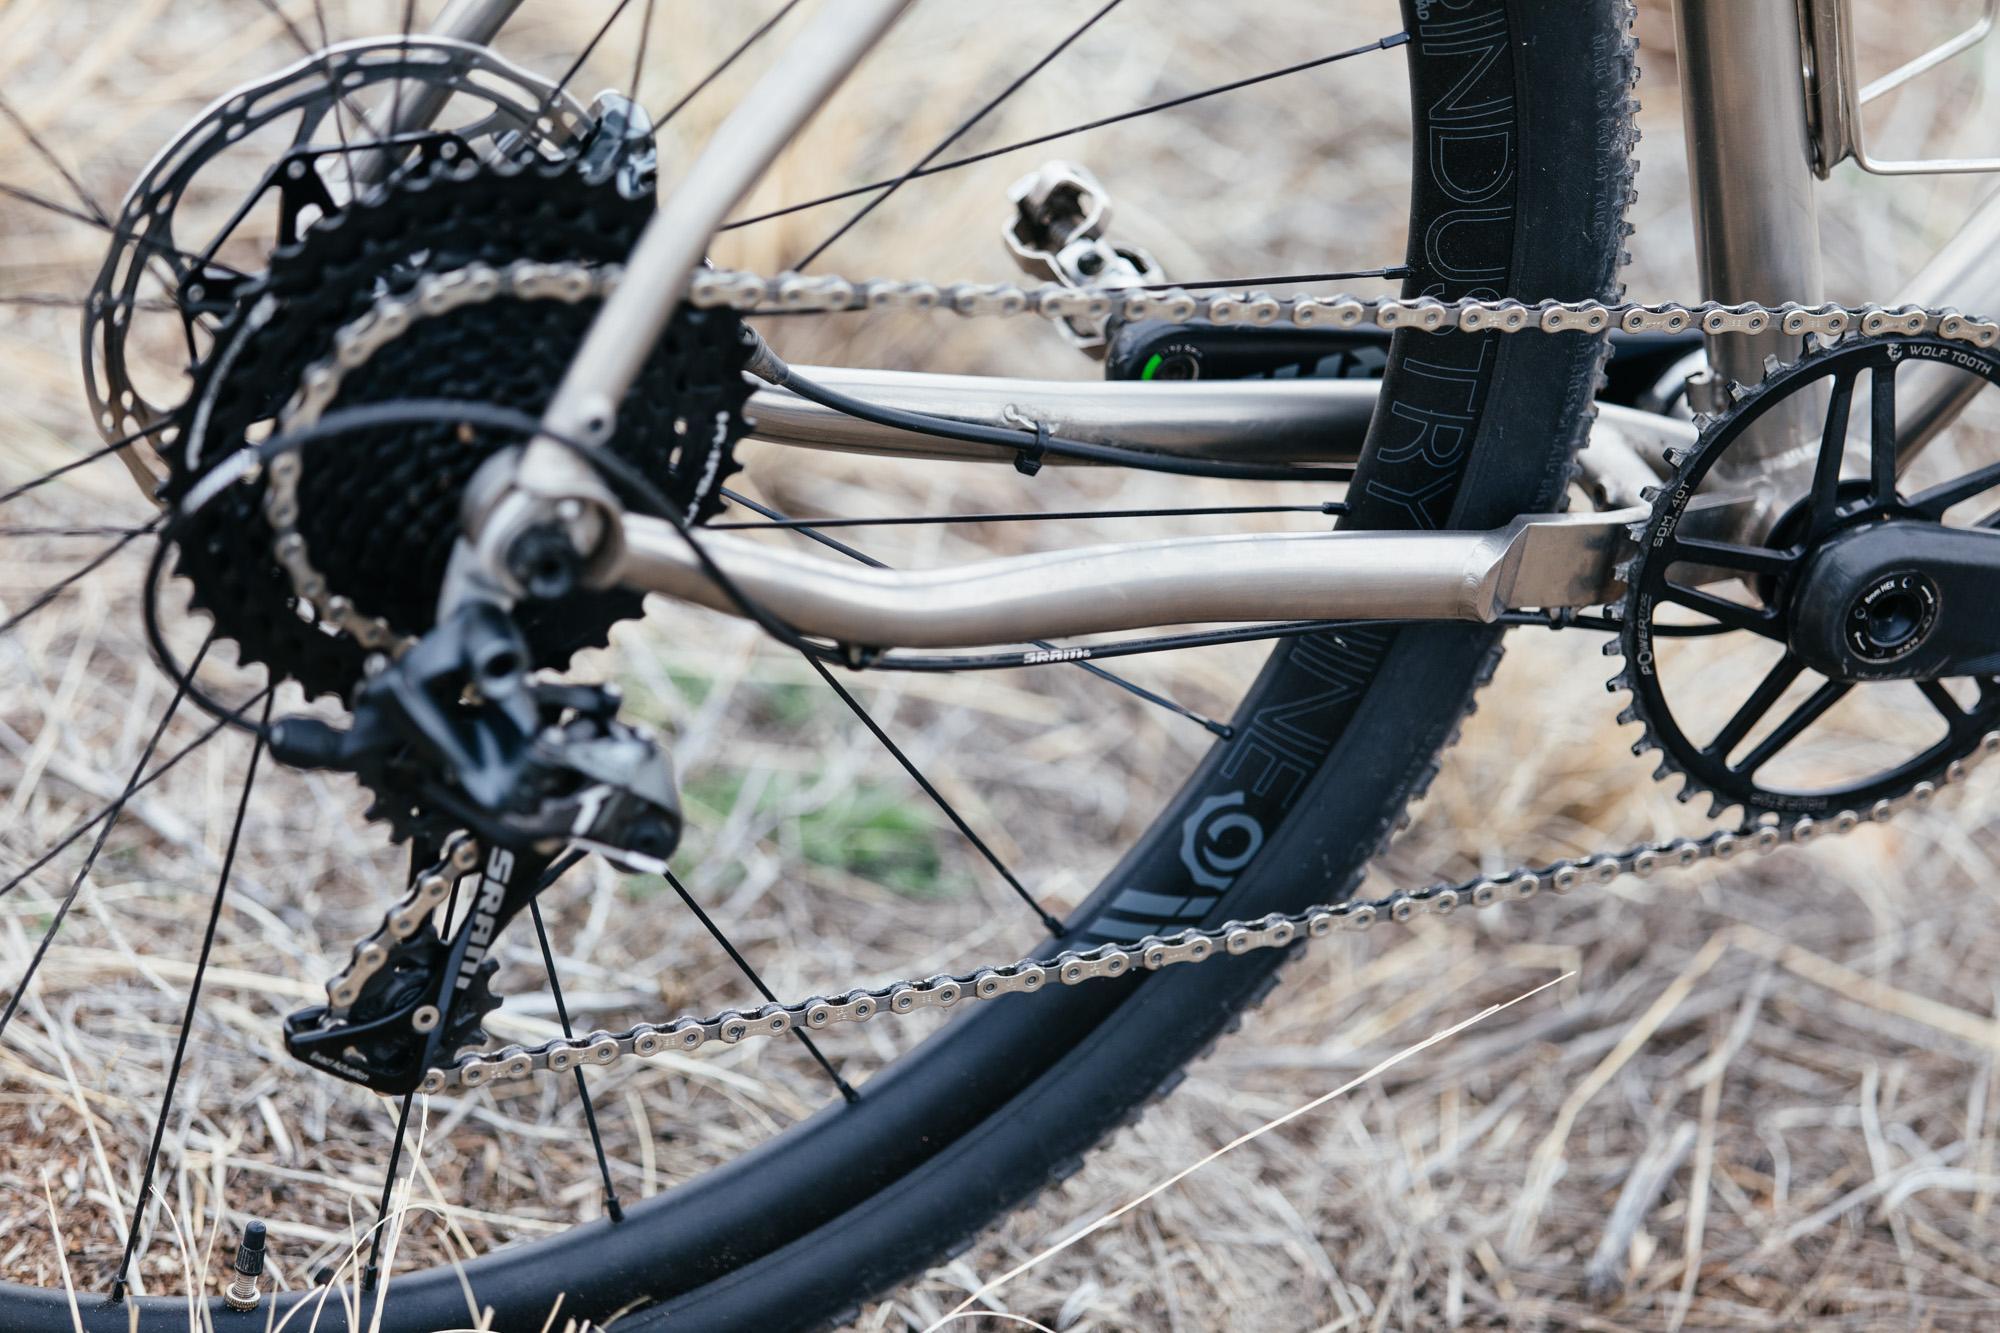 J's Black Magic Bearclaw Bicycle Co Thunderhawk Gravel Bike